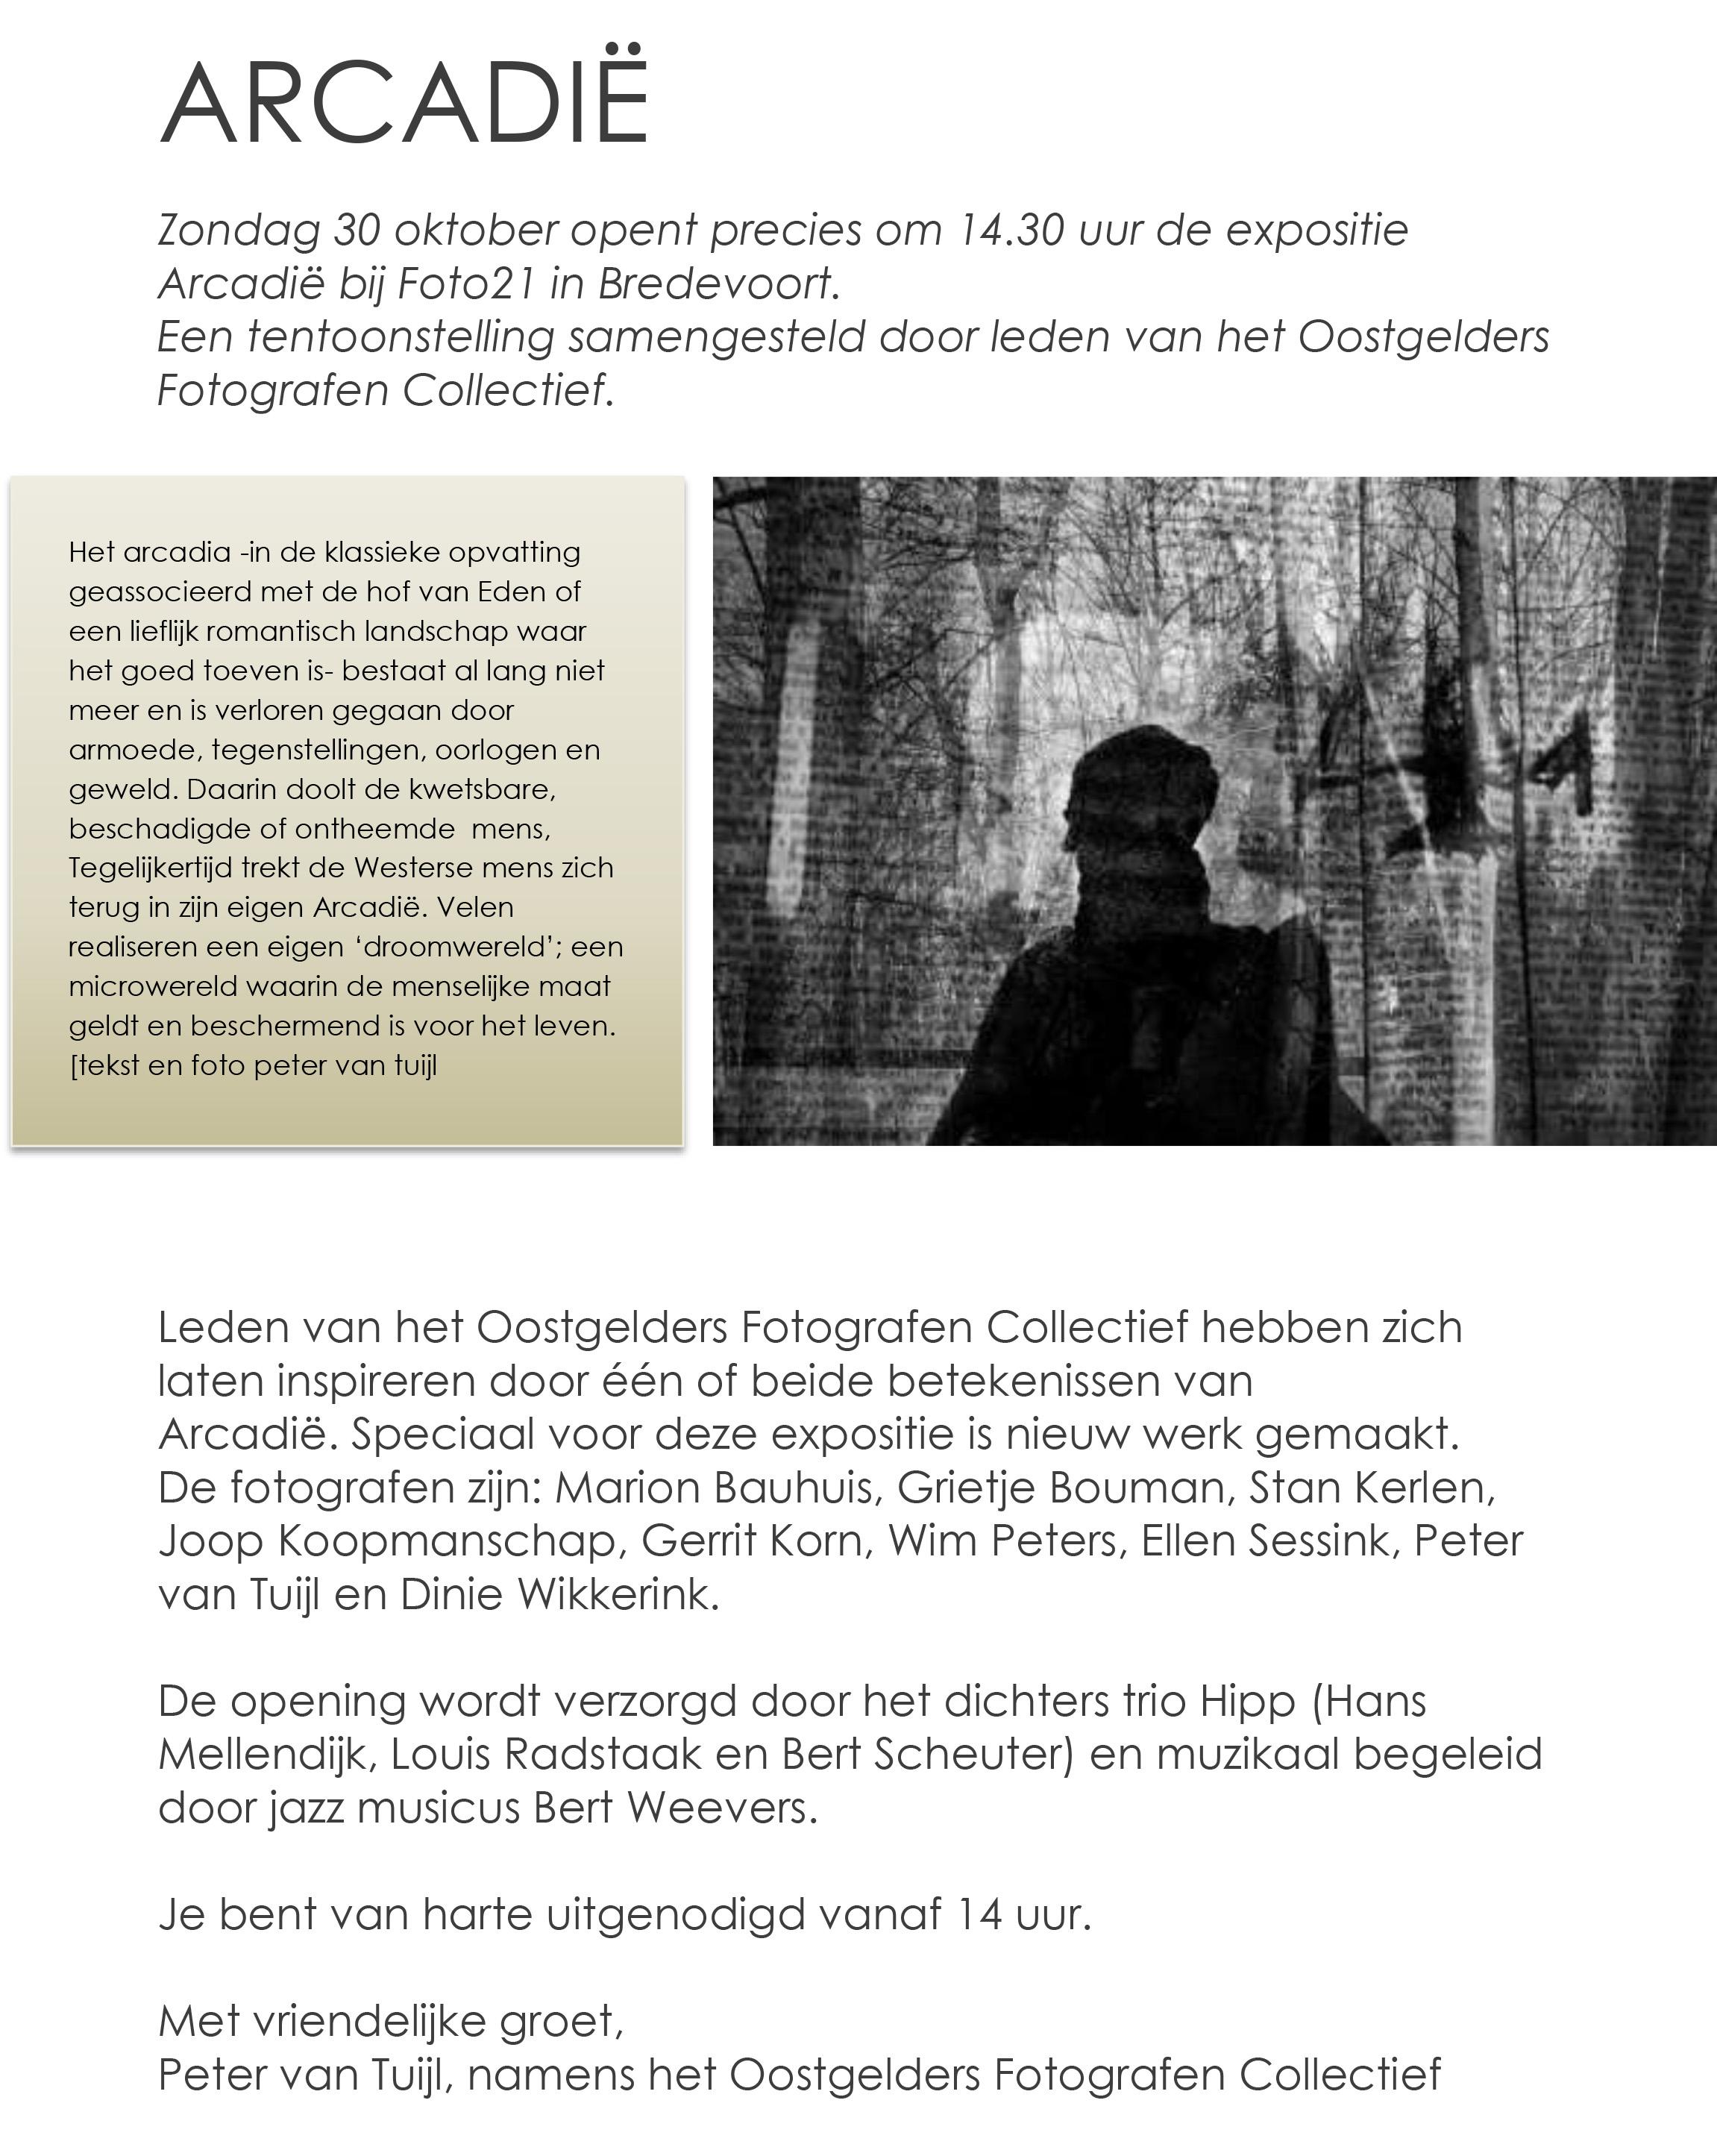 arcadie-uitnodiging-expositie